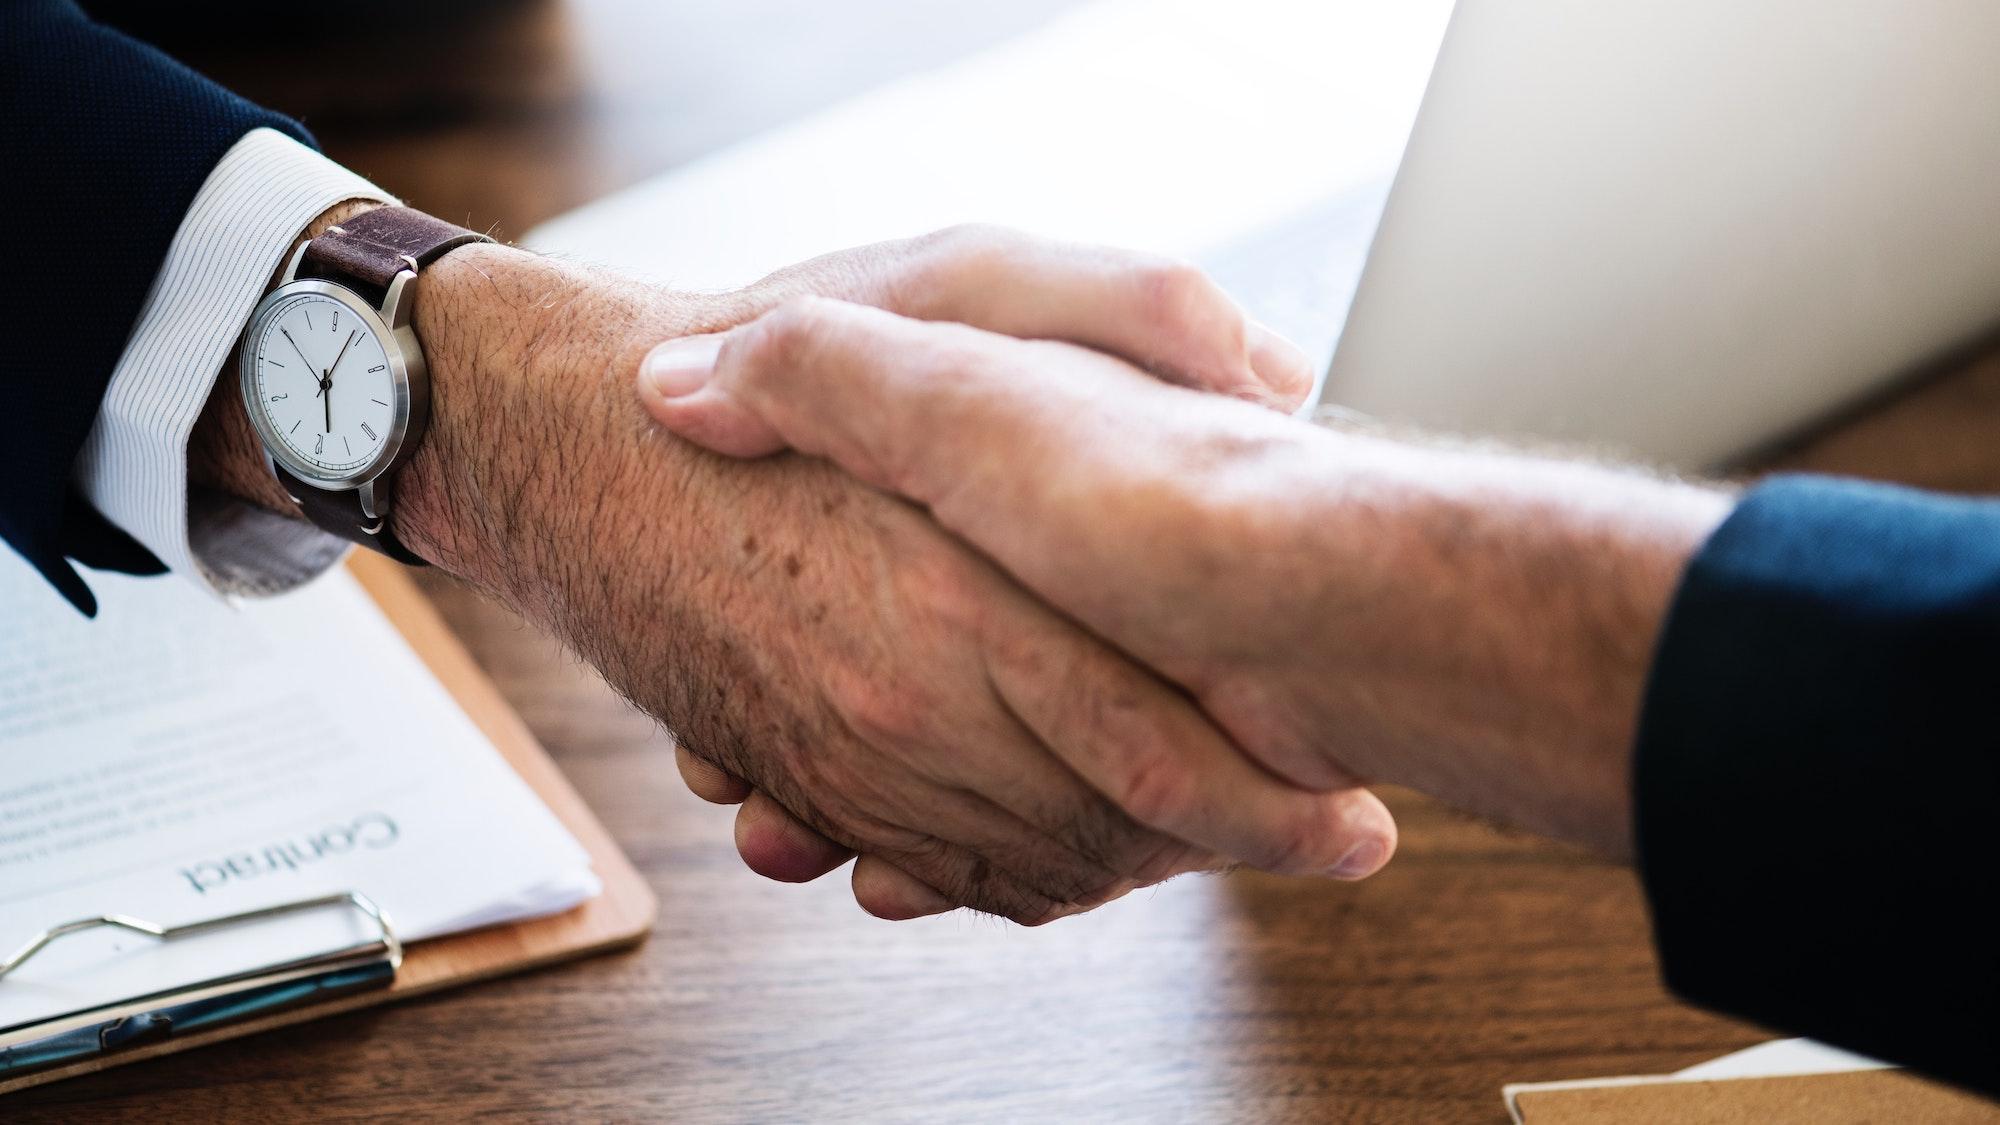 handshake-agreement.jpg